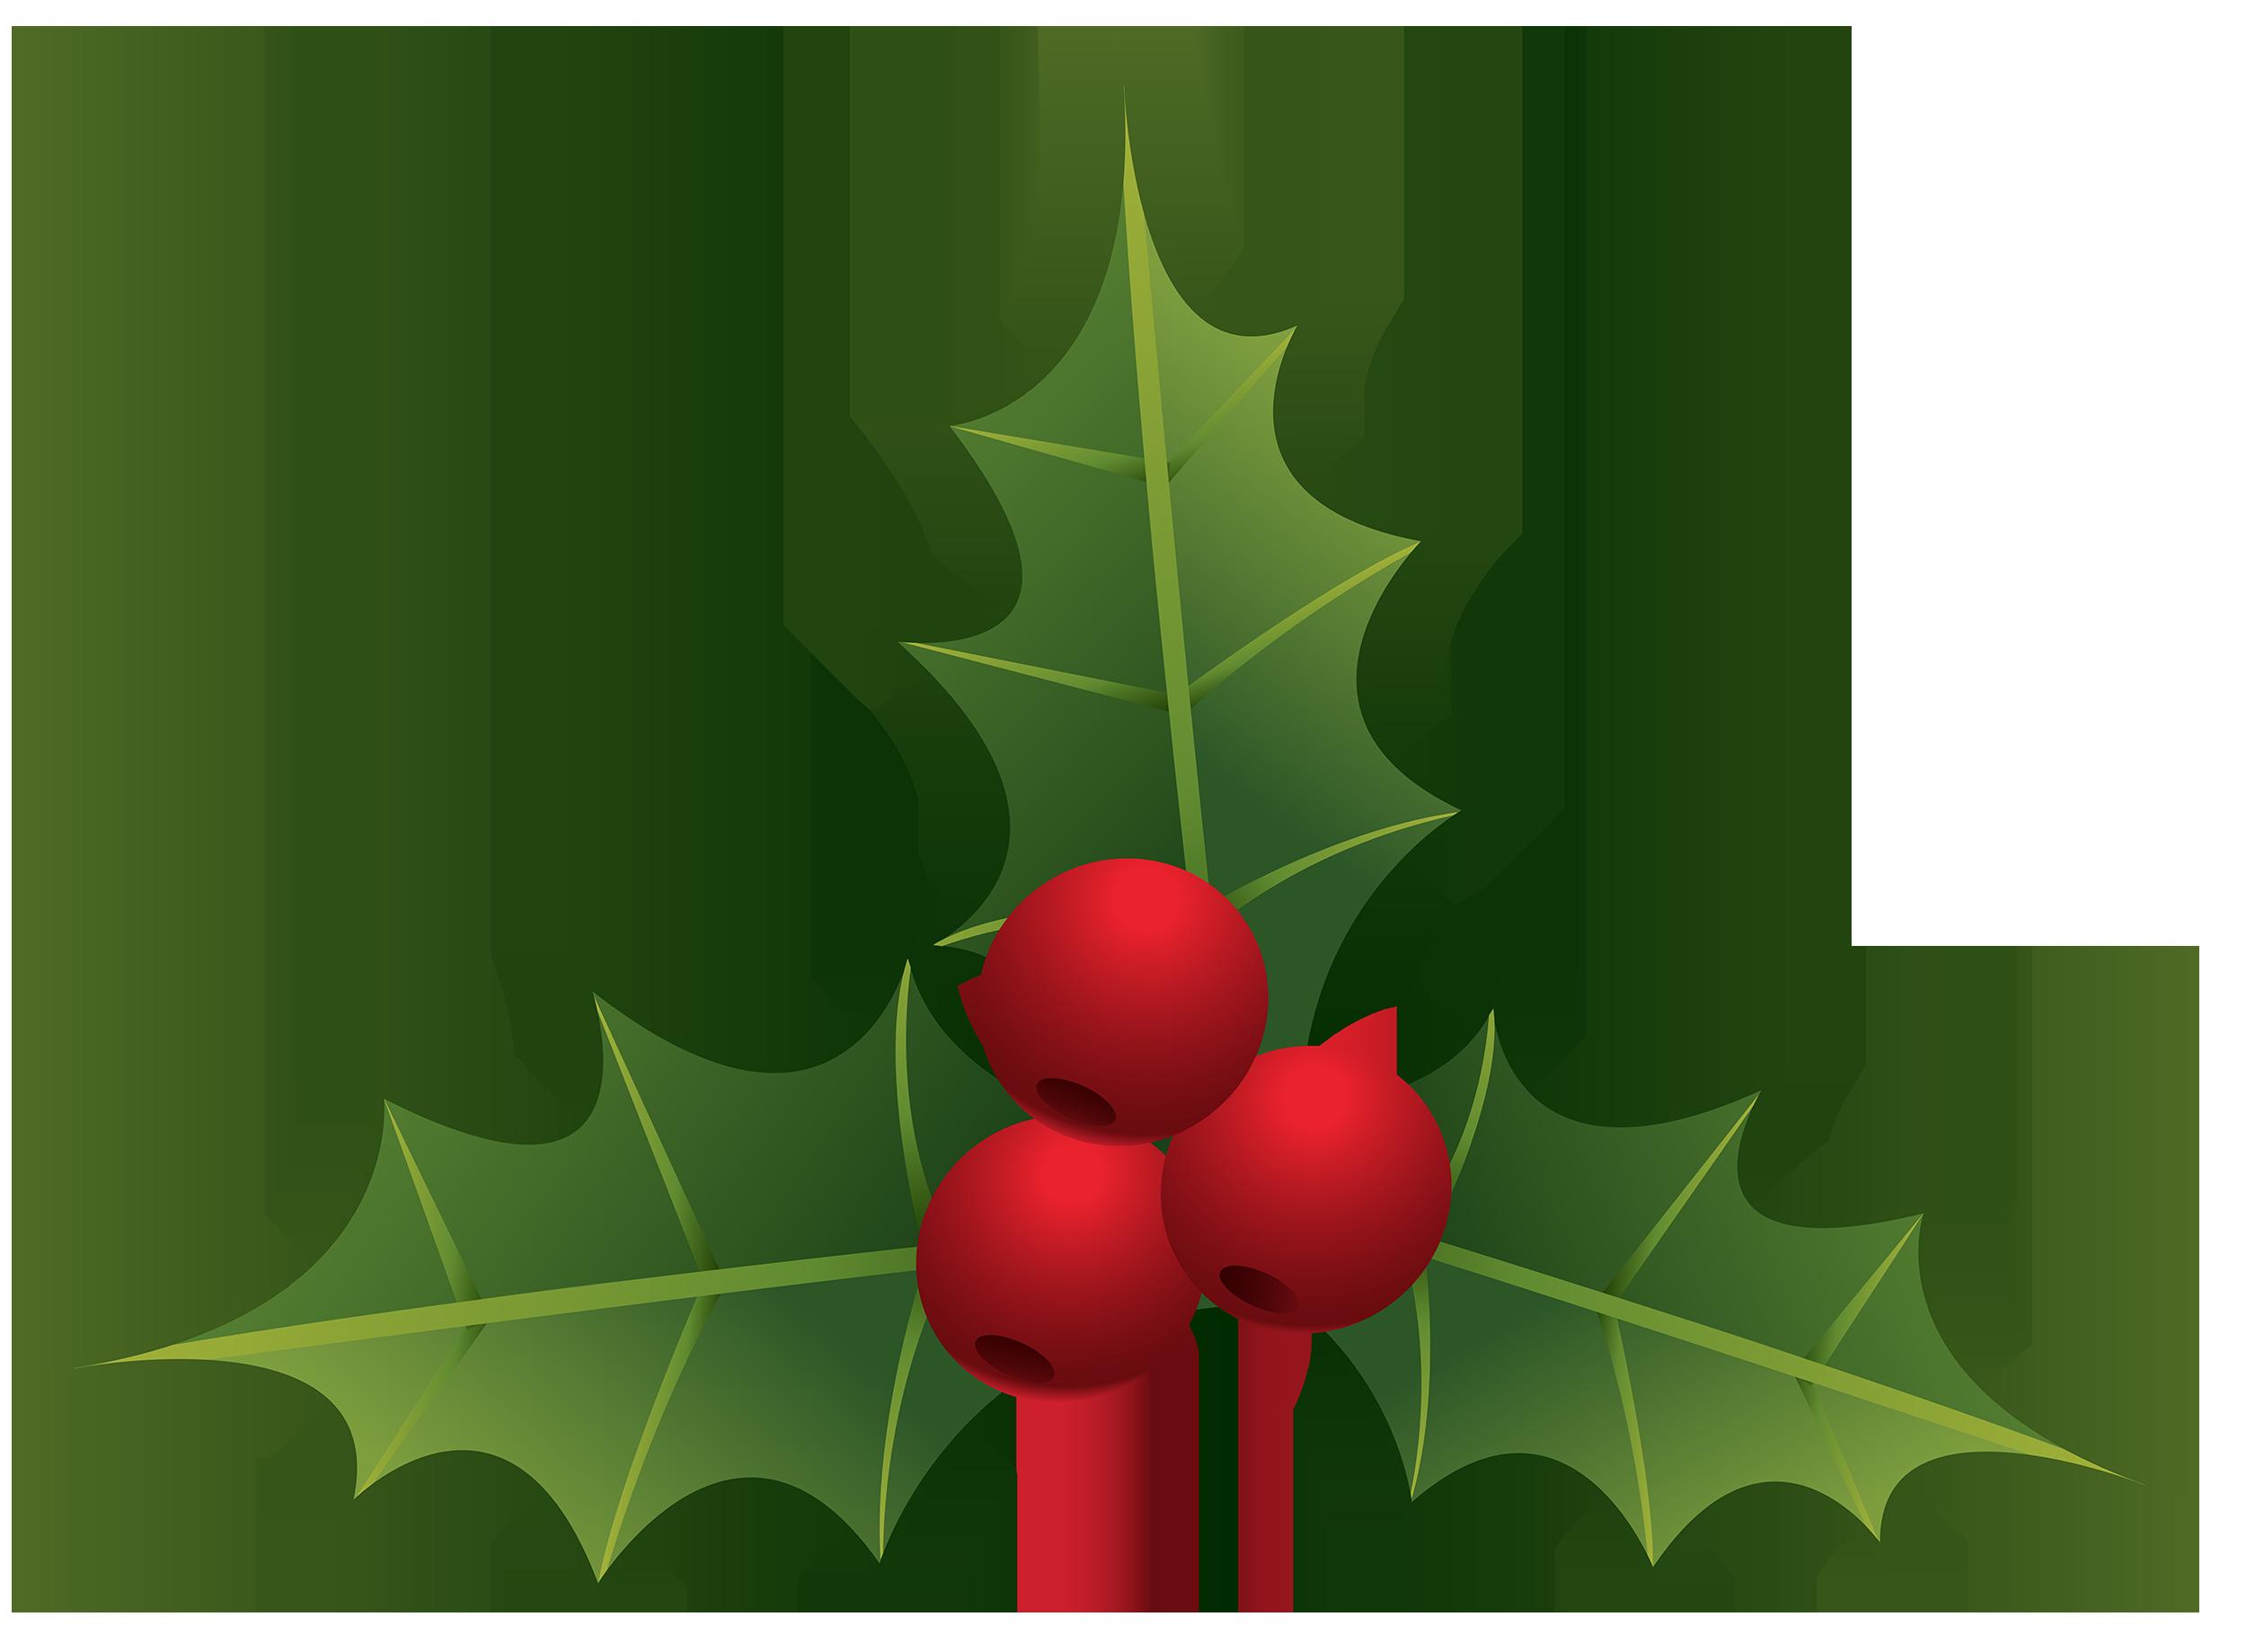 Christmas mistletoe clipart image black and white download Mistletoe PNG Clipart - Best WEB Clipart image black and white download